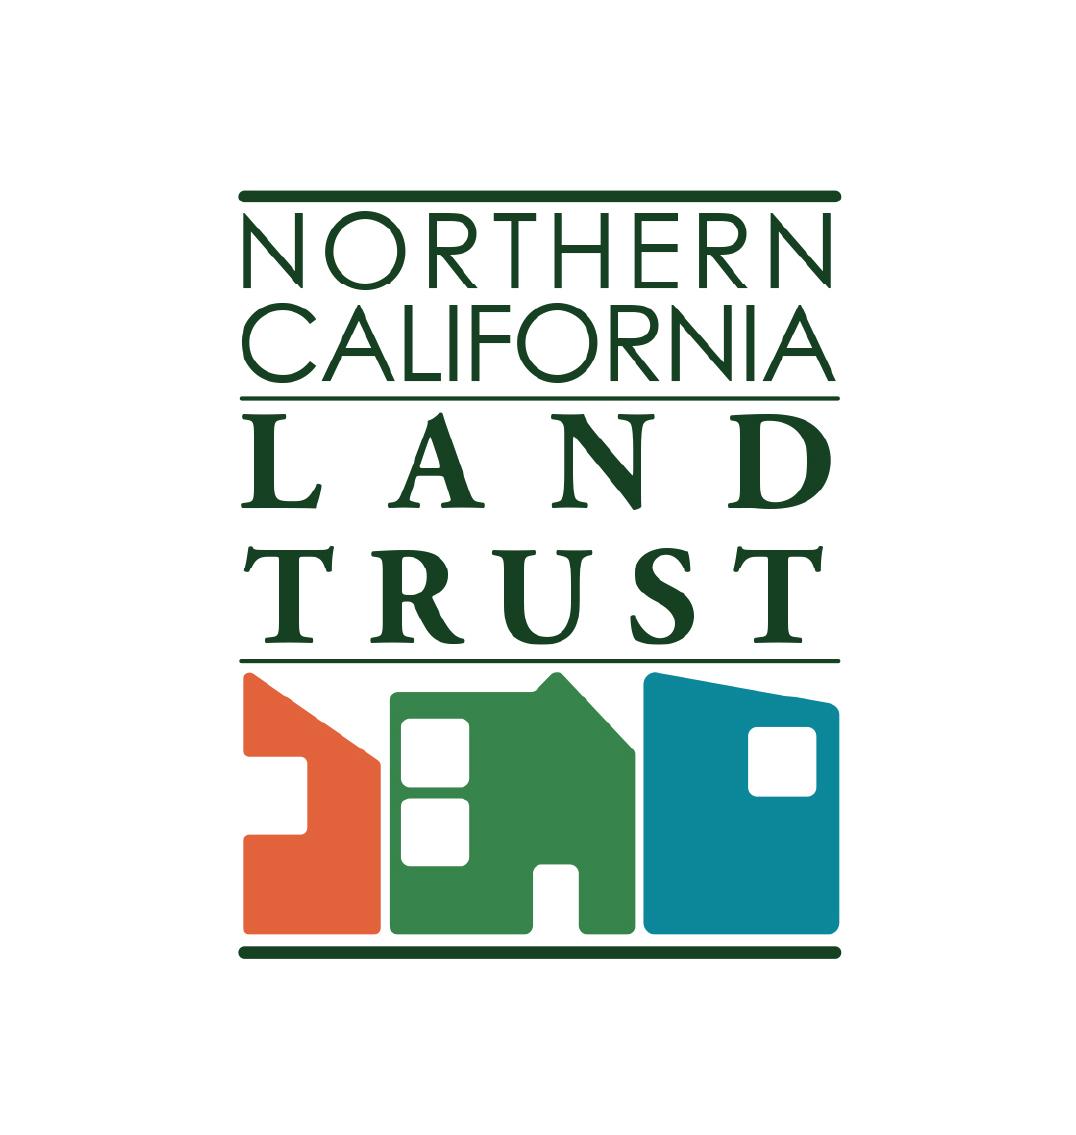 NCLT logo